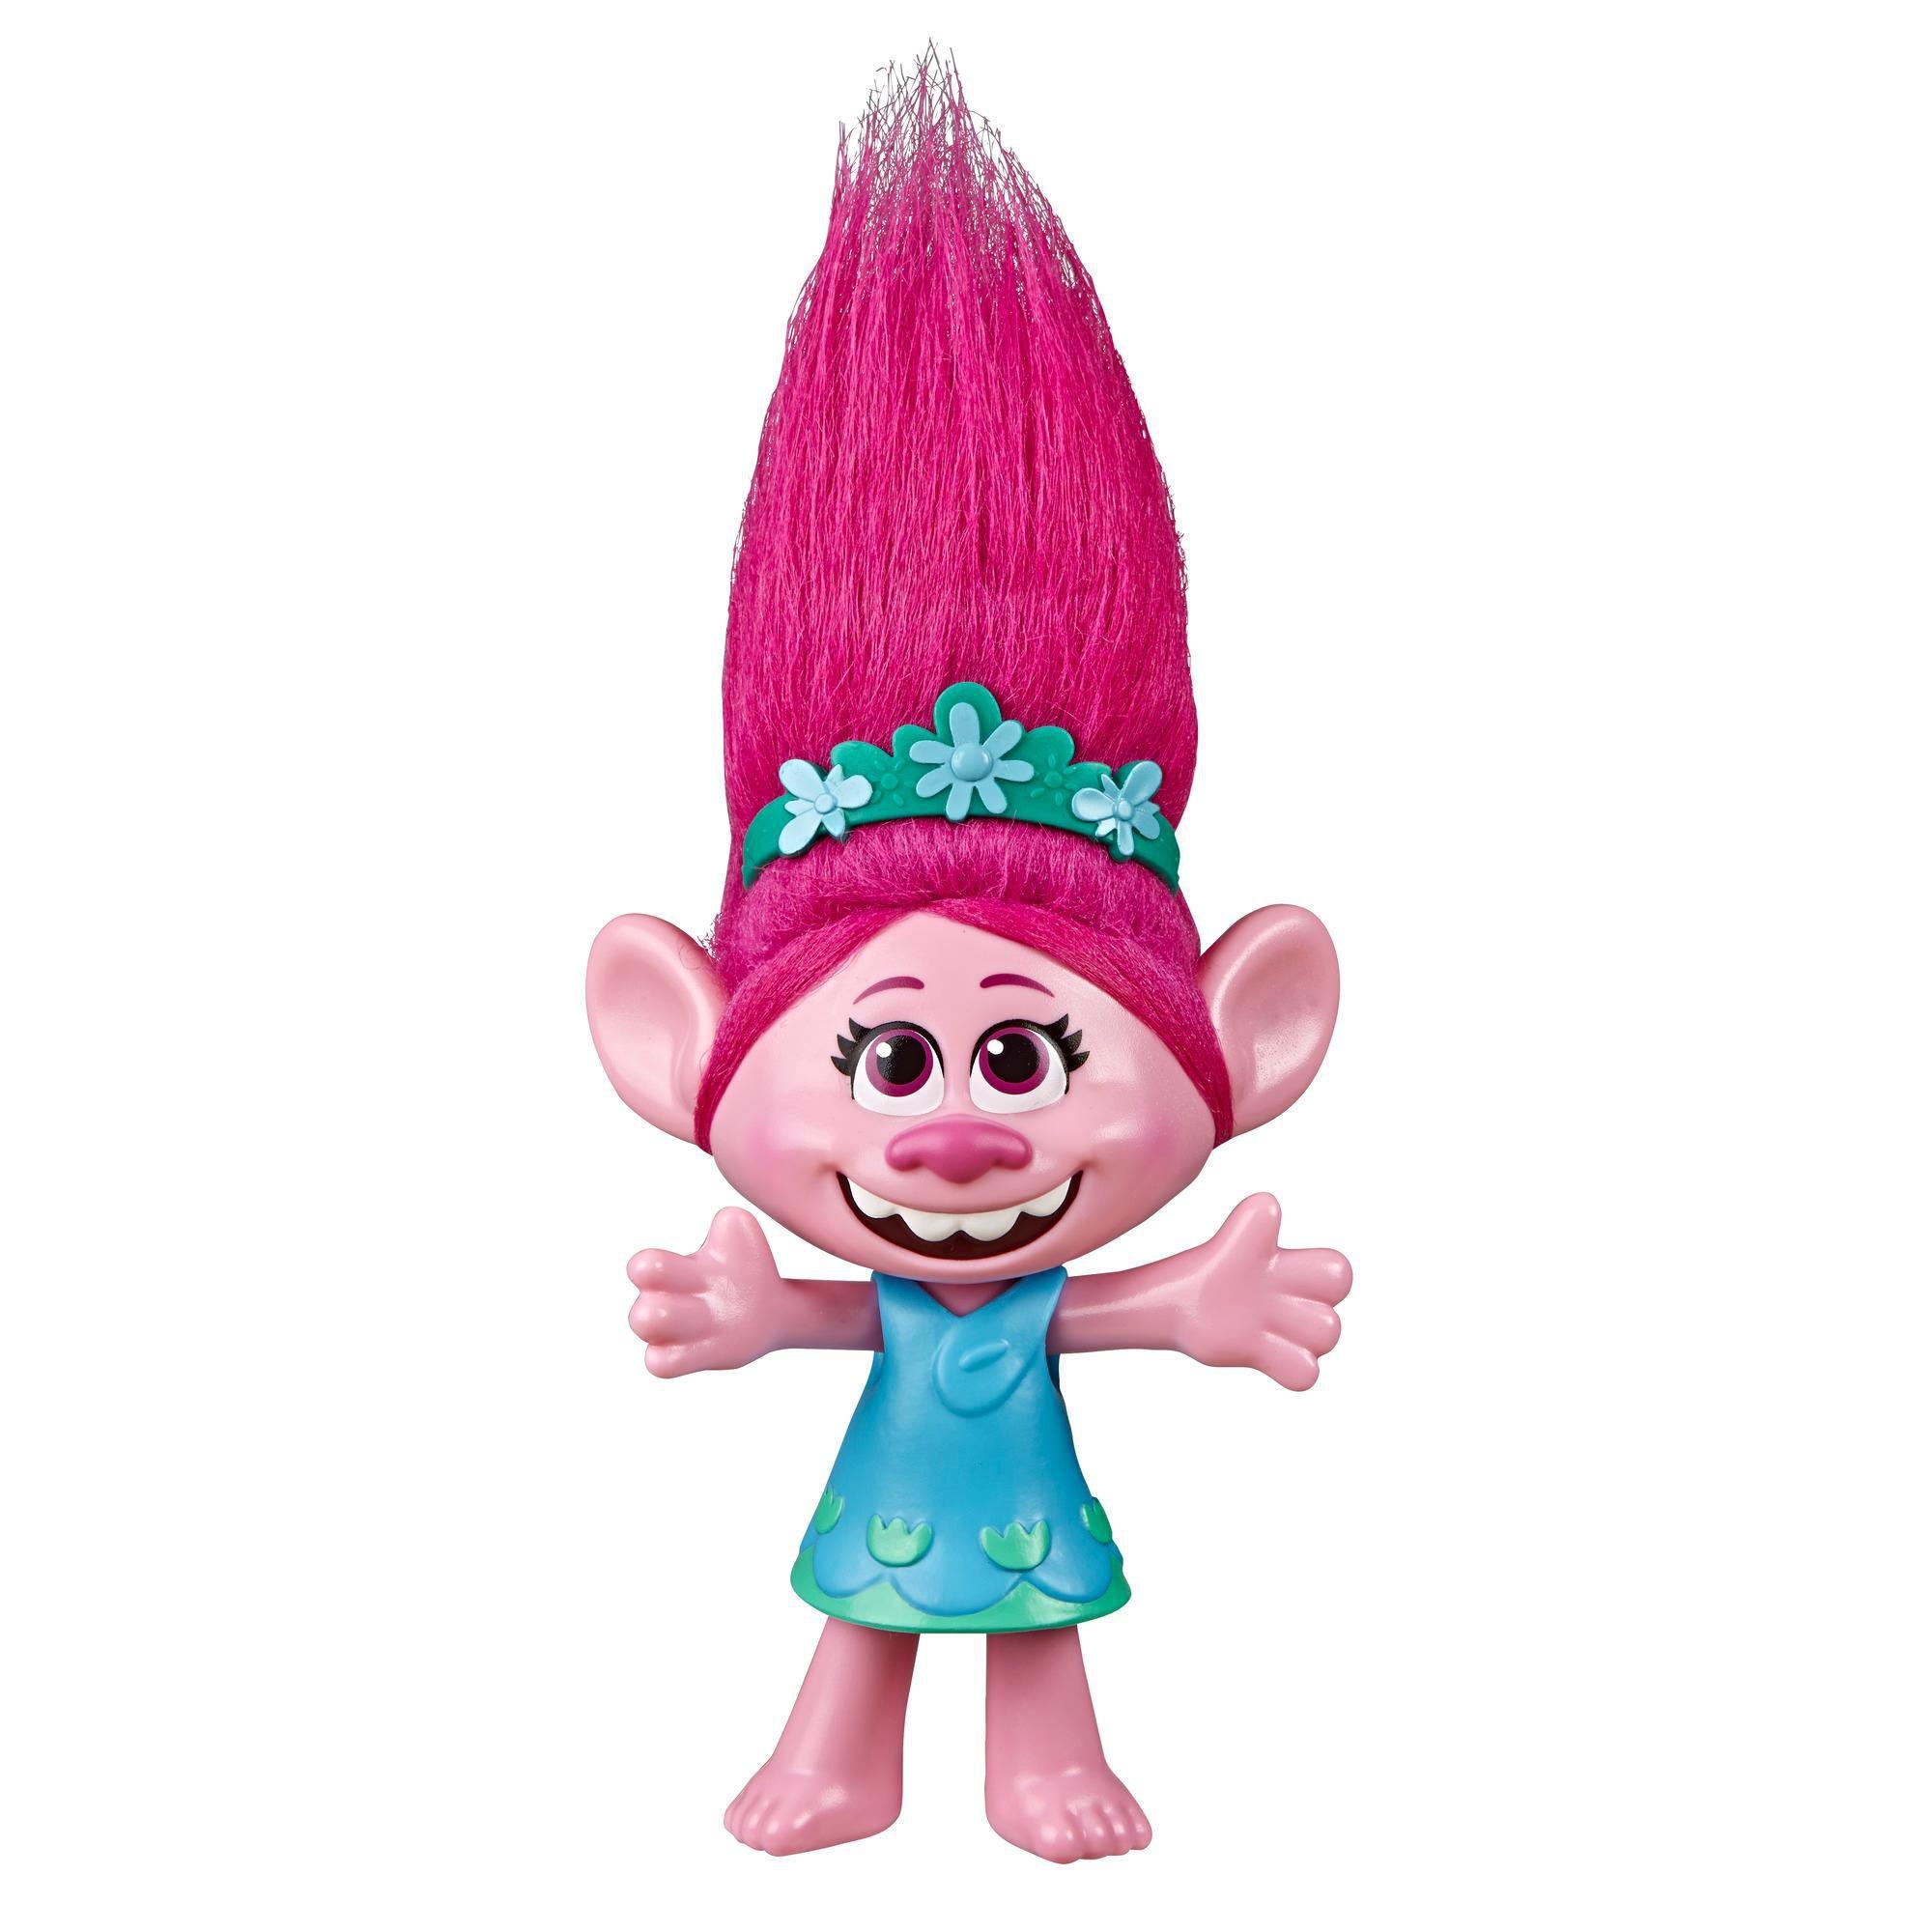 Boneca Poppy Cantora Pop (Fala e Canta): Trolls 2 (World Tour) - Hasbro